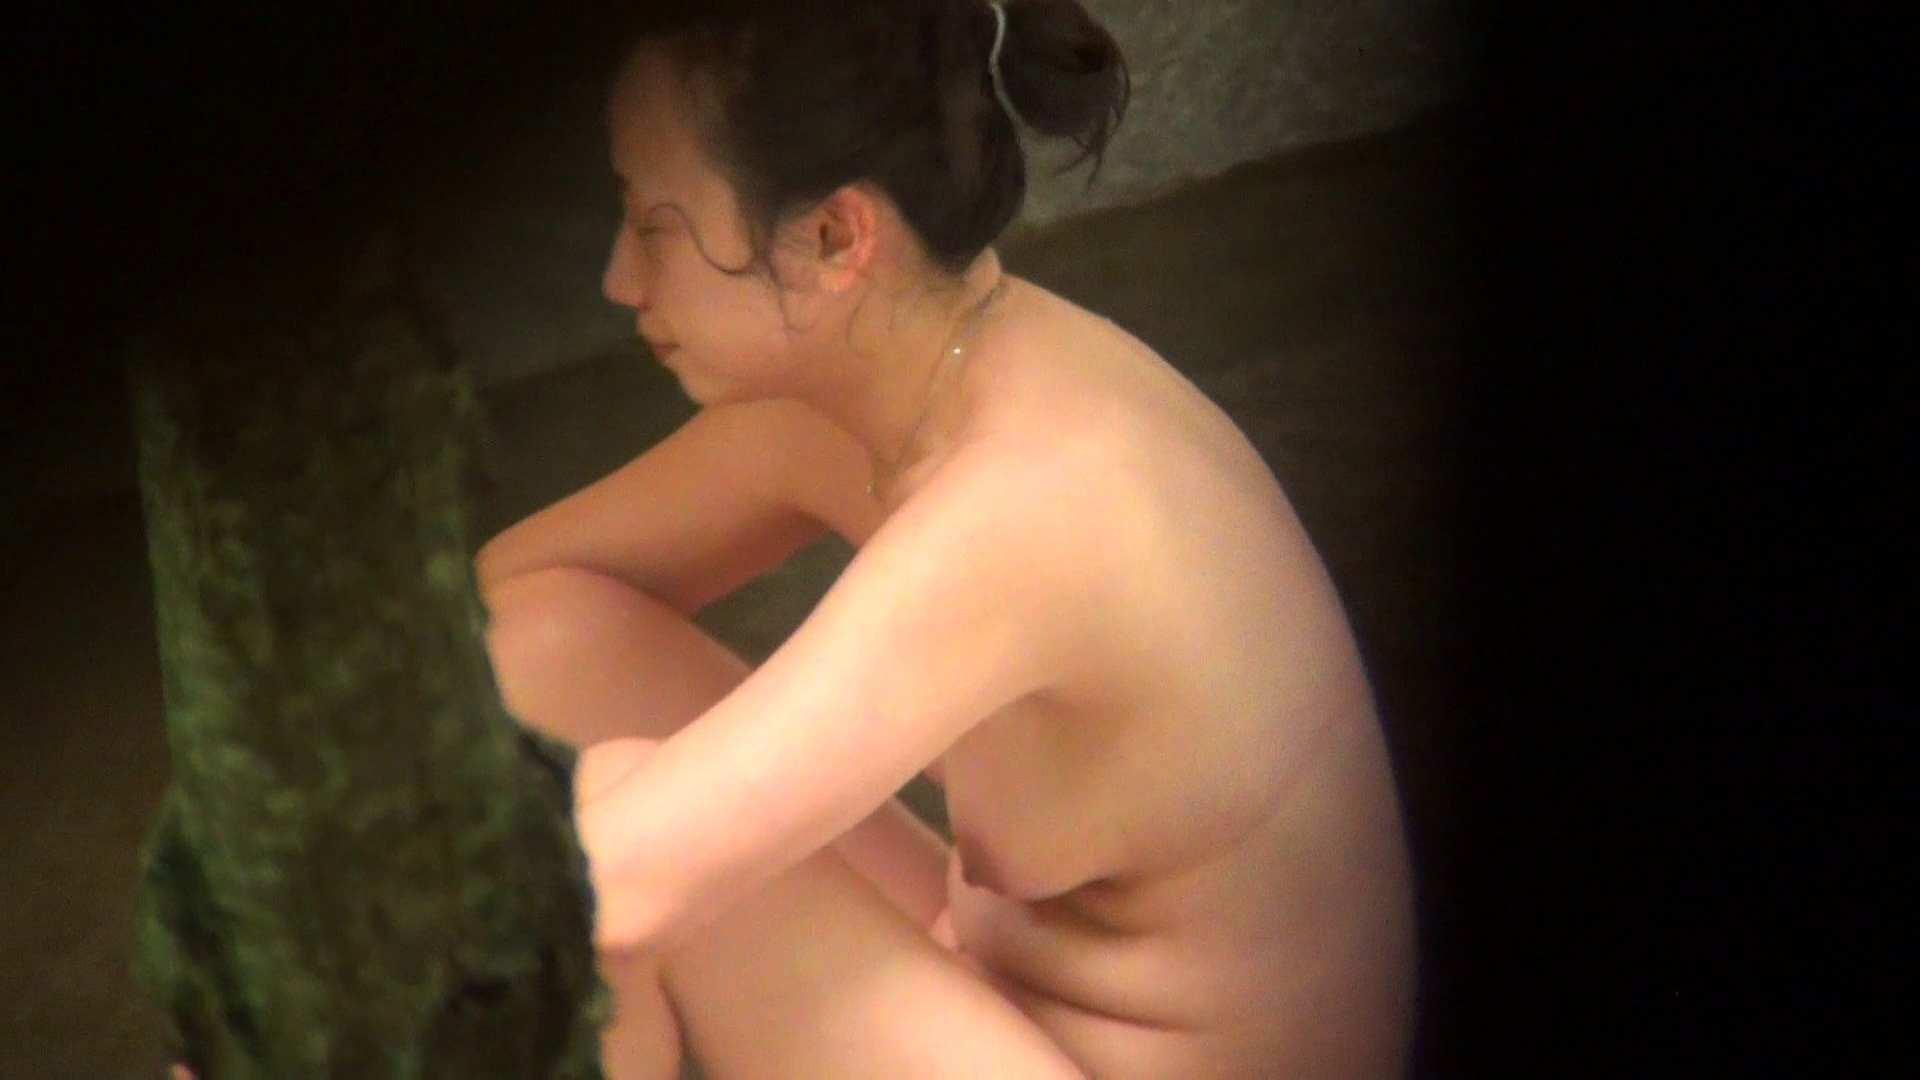 Aquaな露天風呂Vol.310 OL女体  56連発 48